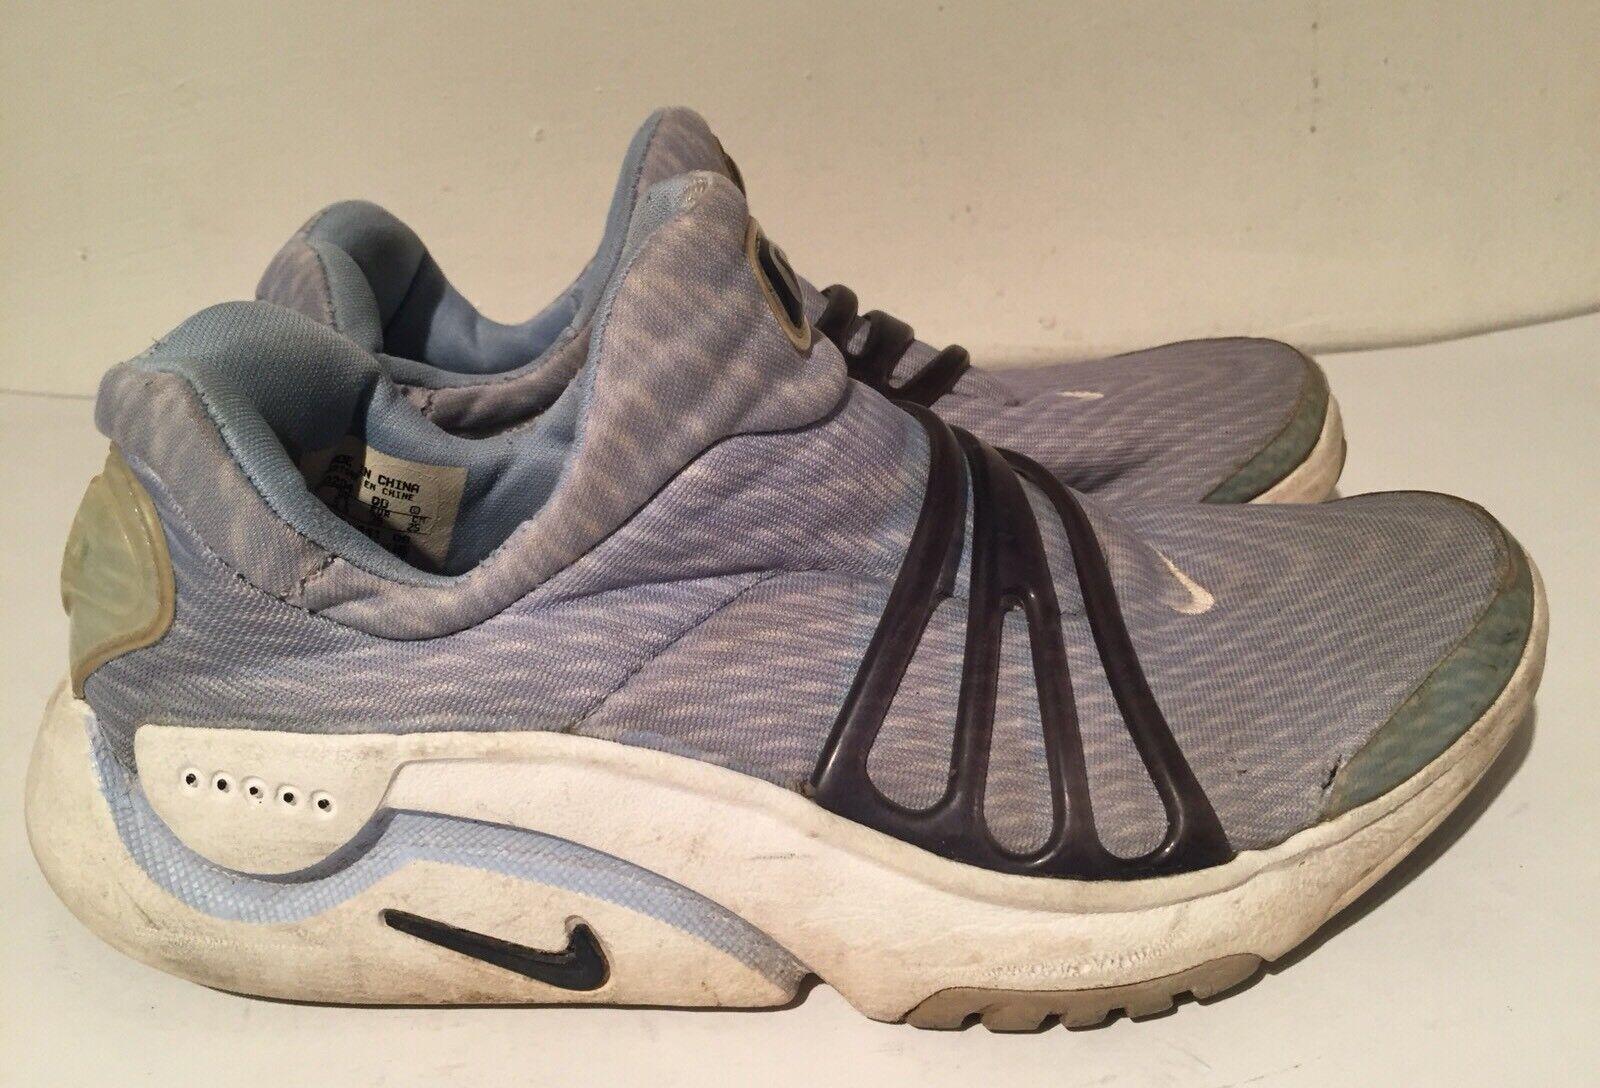 Women's Nike Air Presto QS Baskets UK 5 Vintage RARE 2001